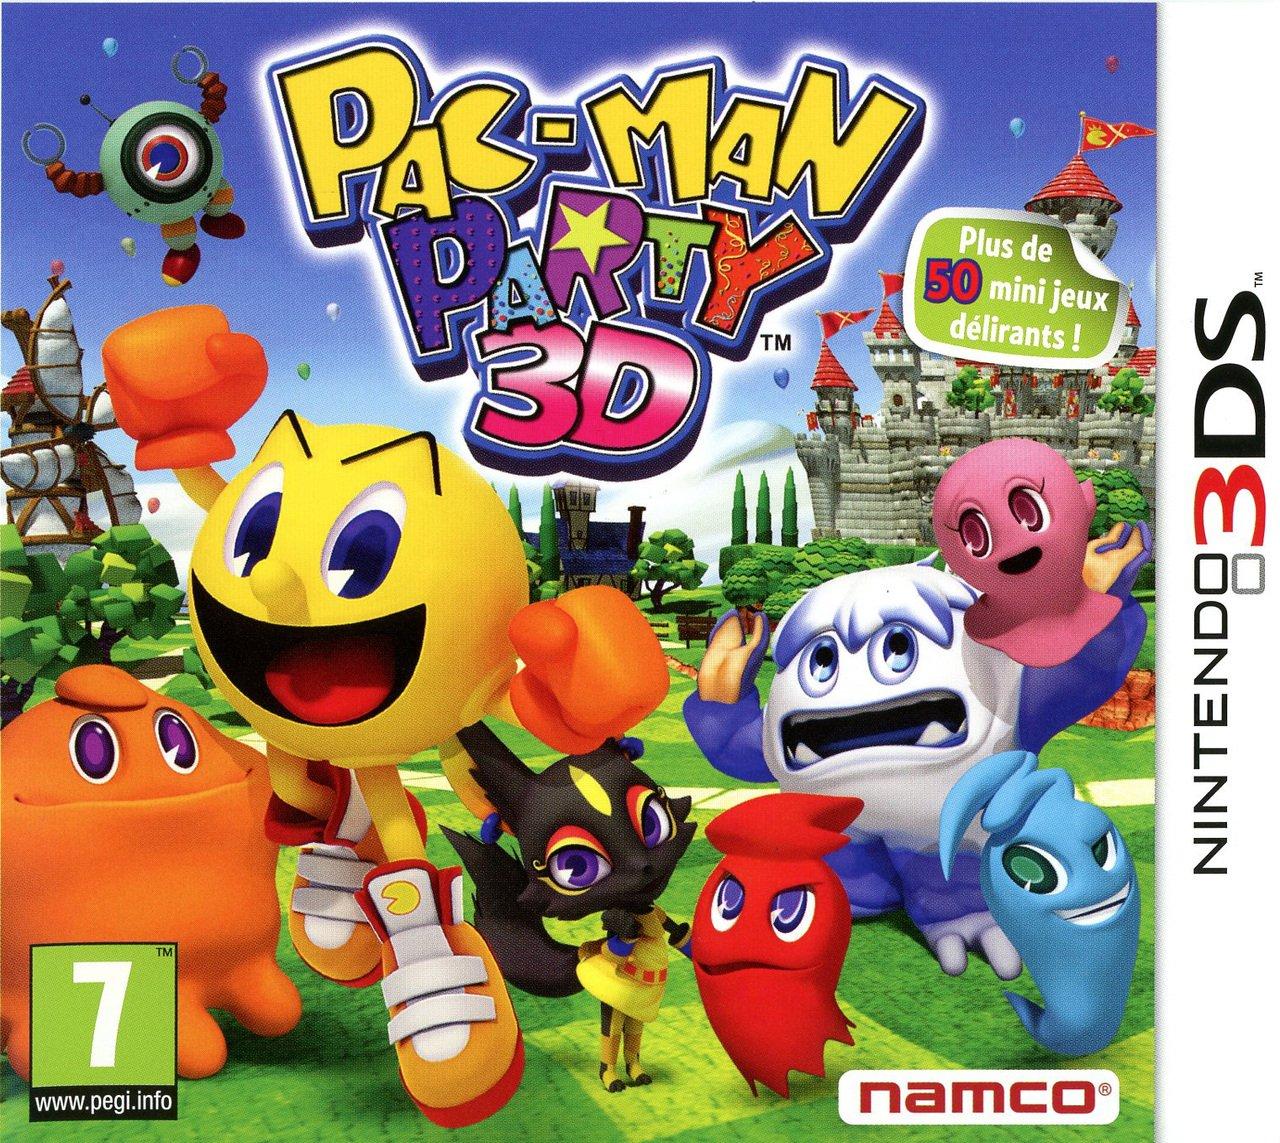 Pac-ManParty3D 3DS Jaquette 002